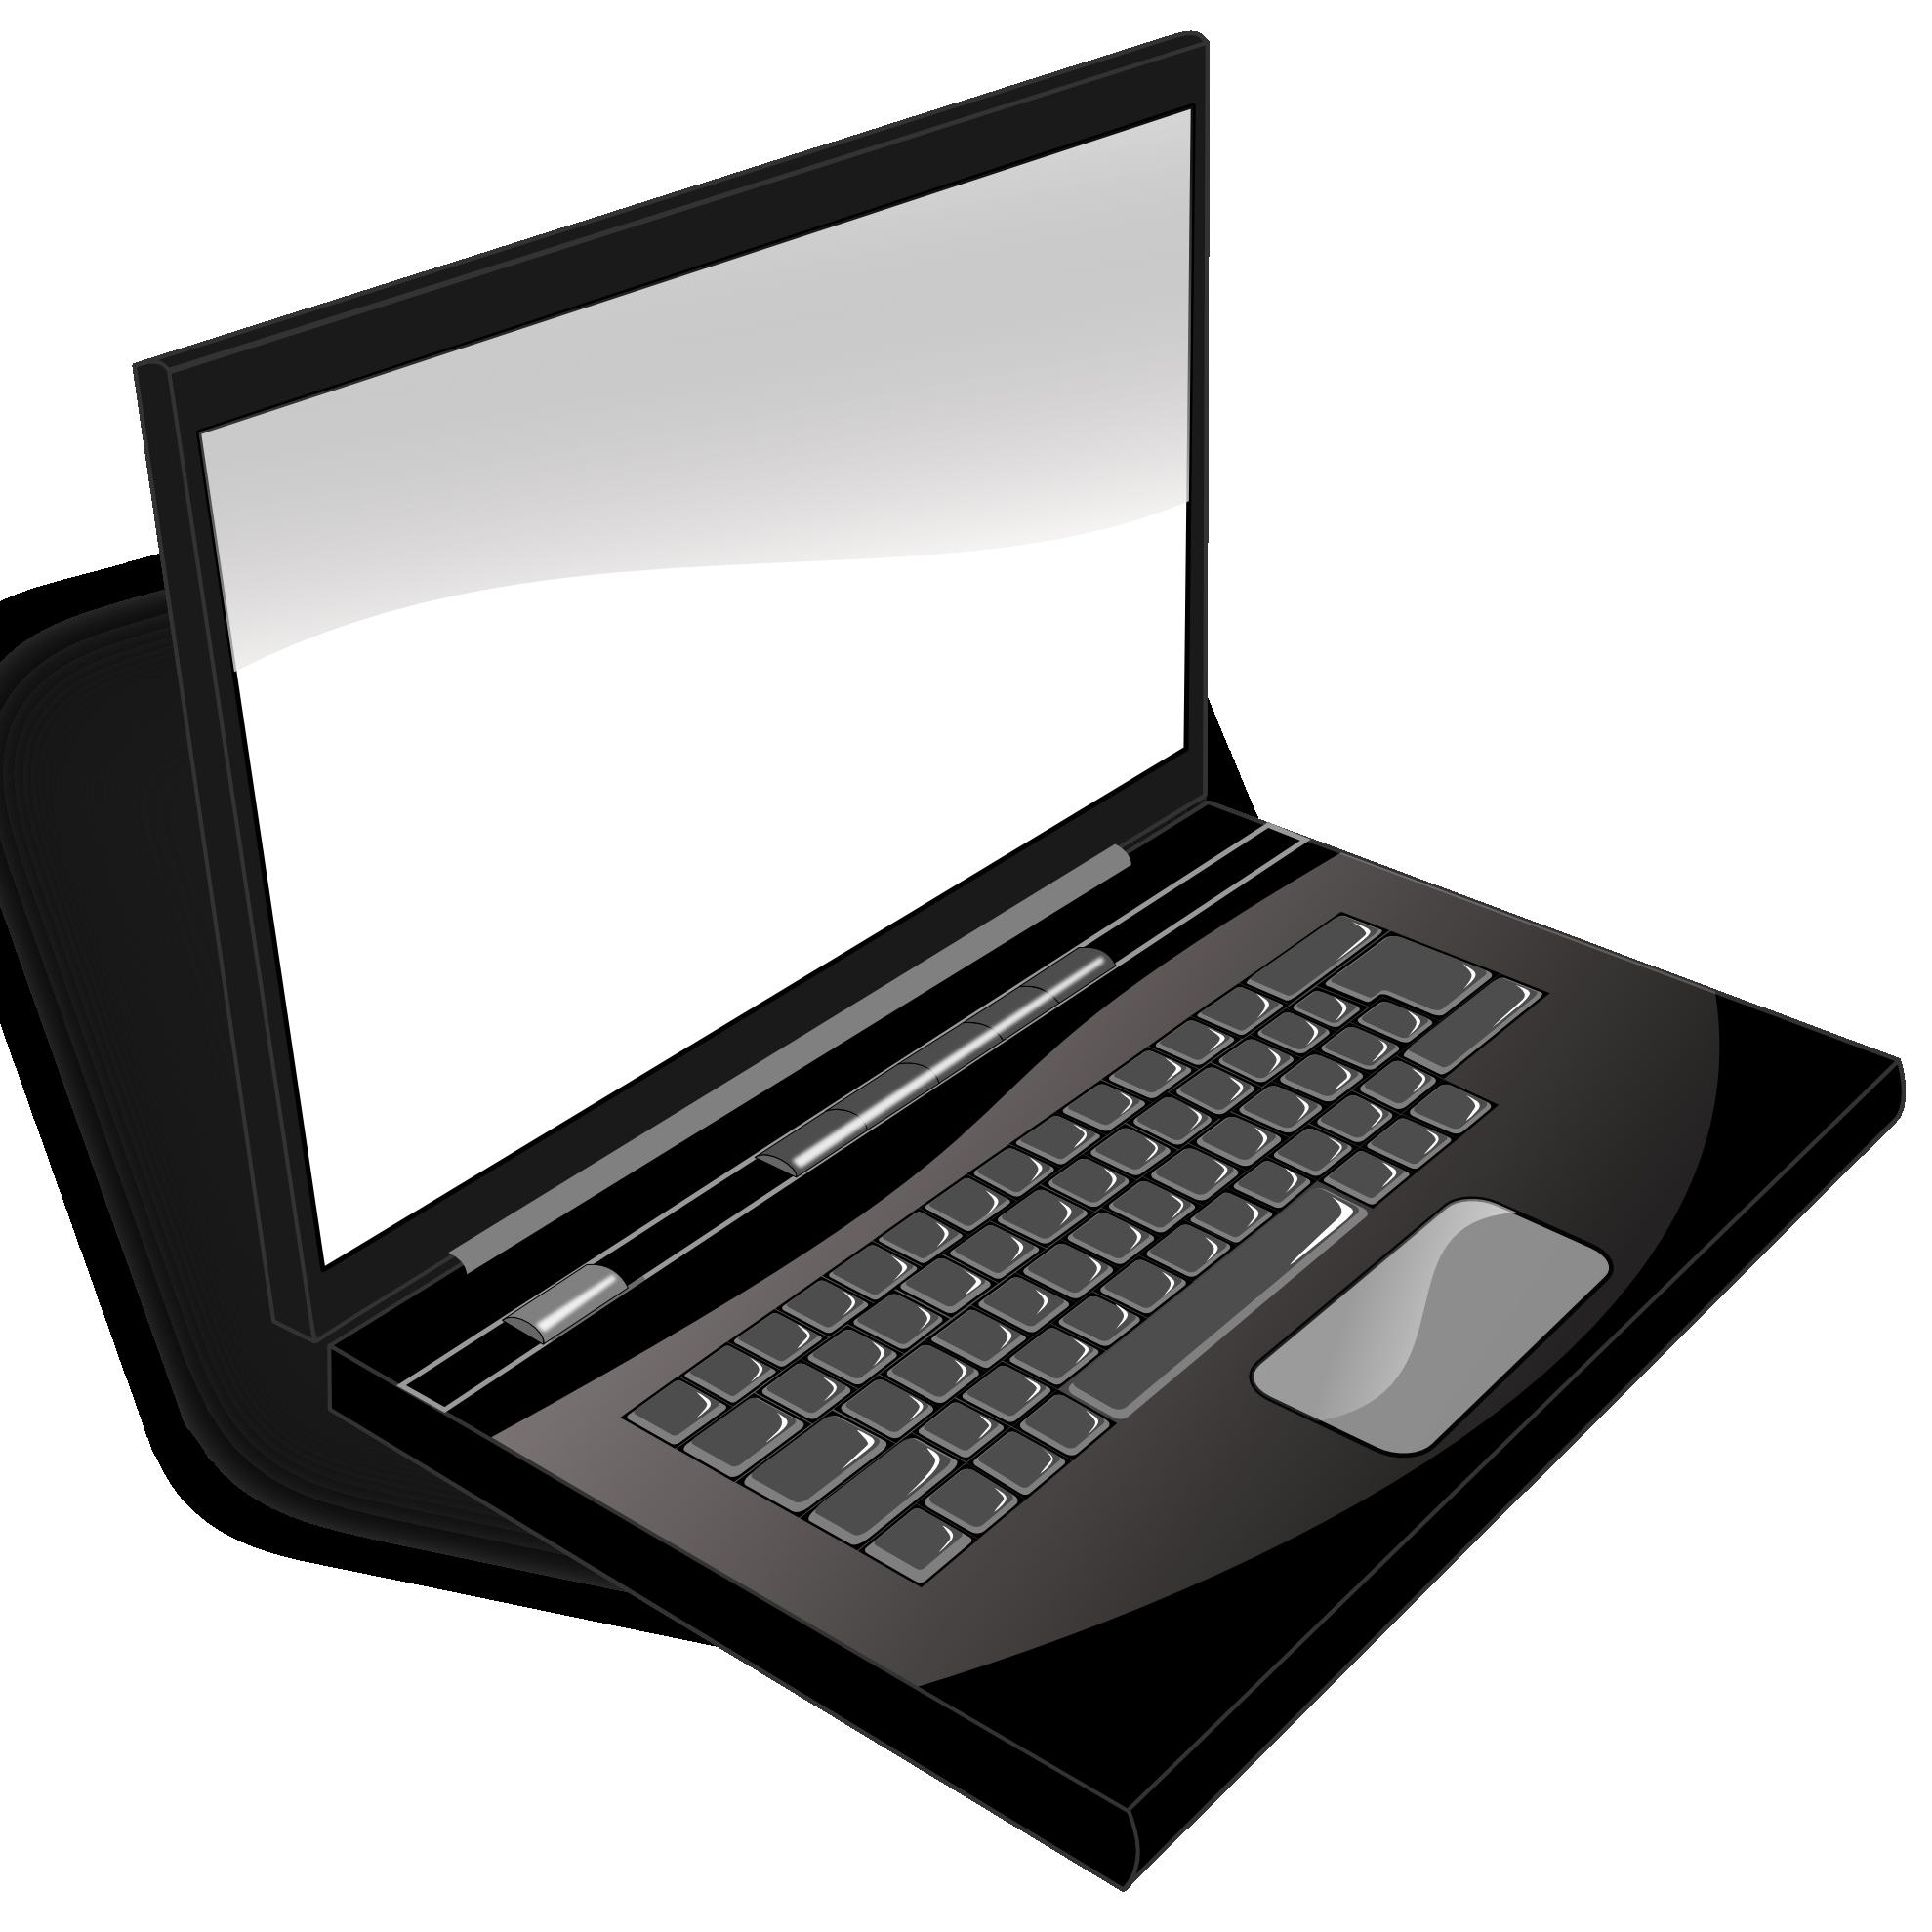 Notebook clipart workbook. Mac laptop panda free